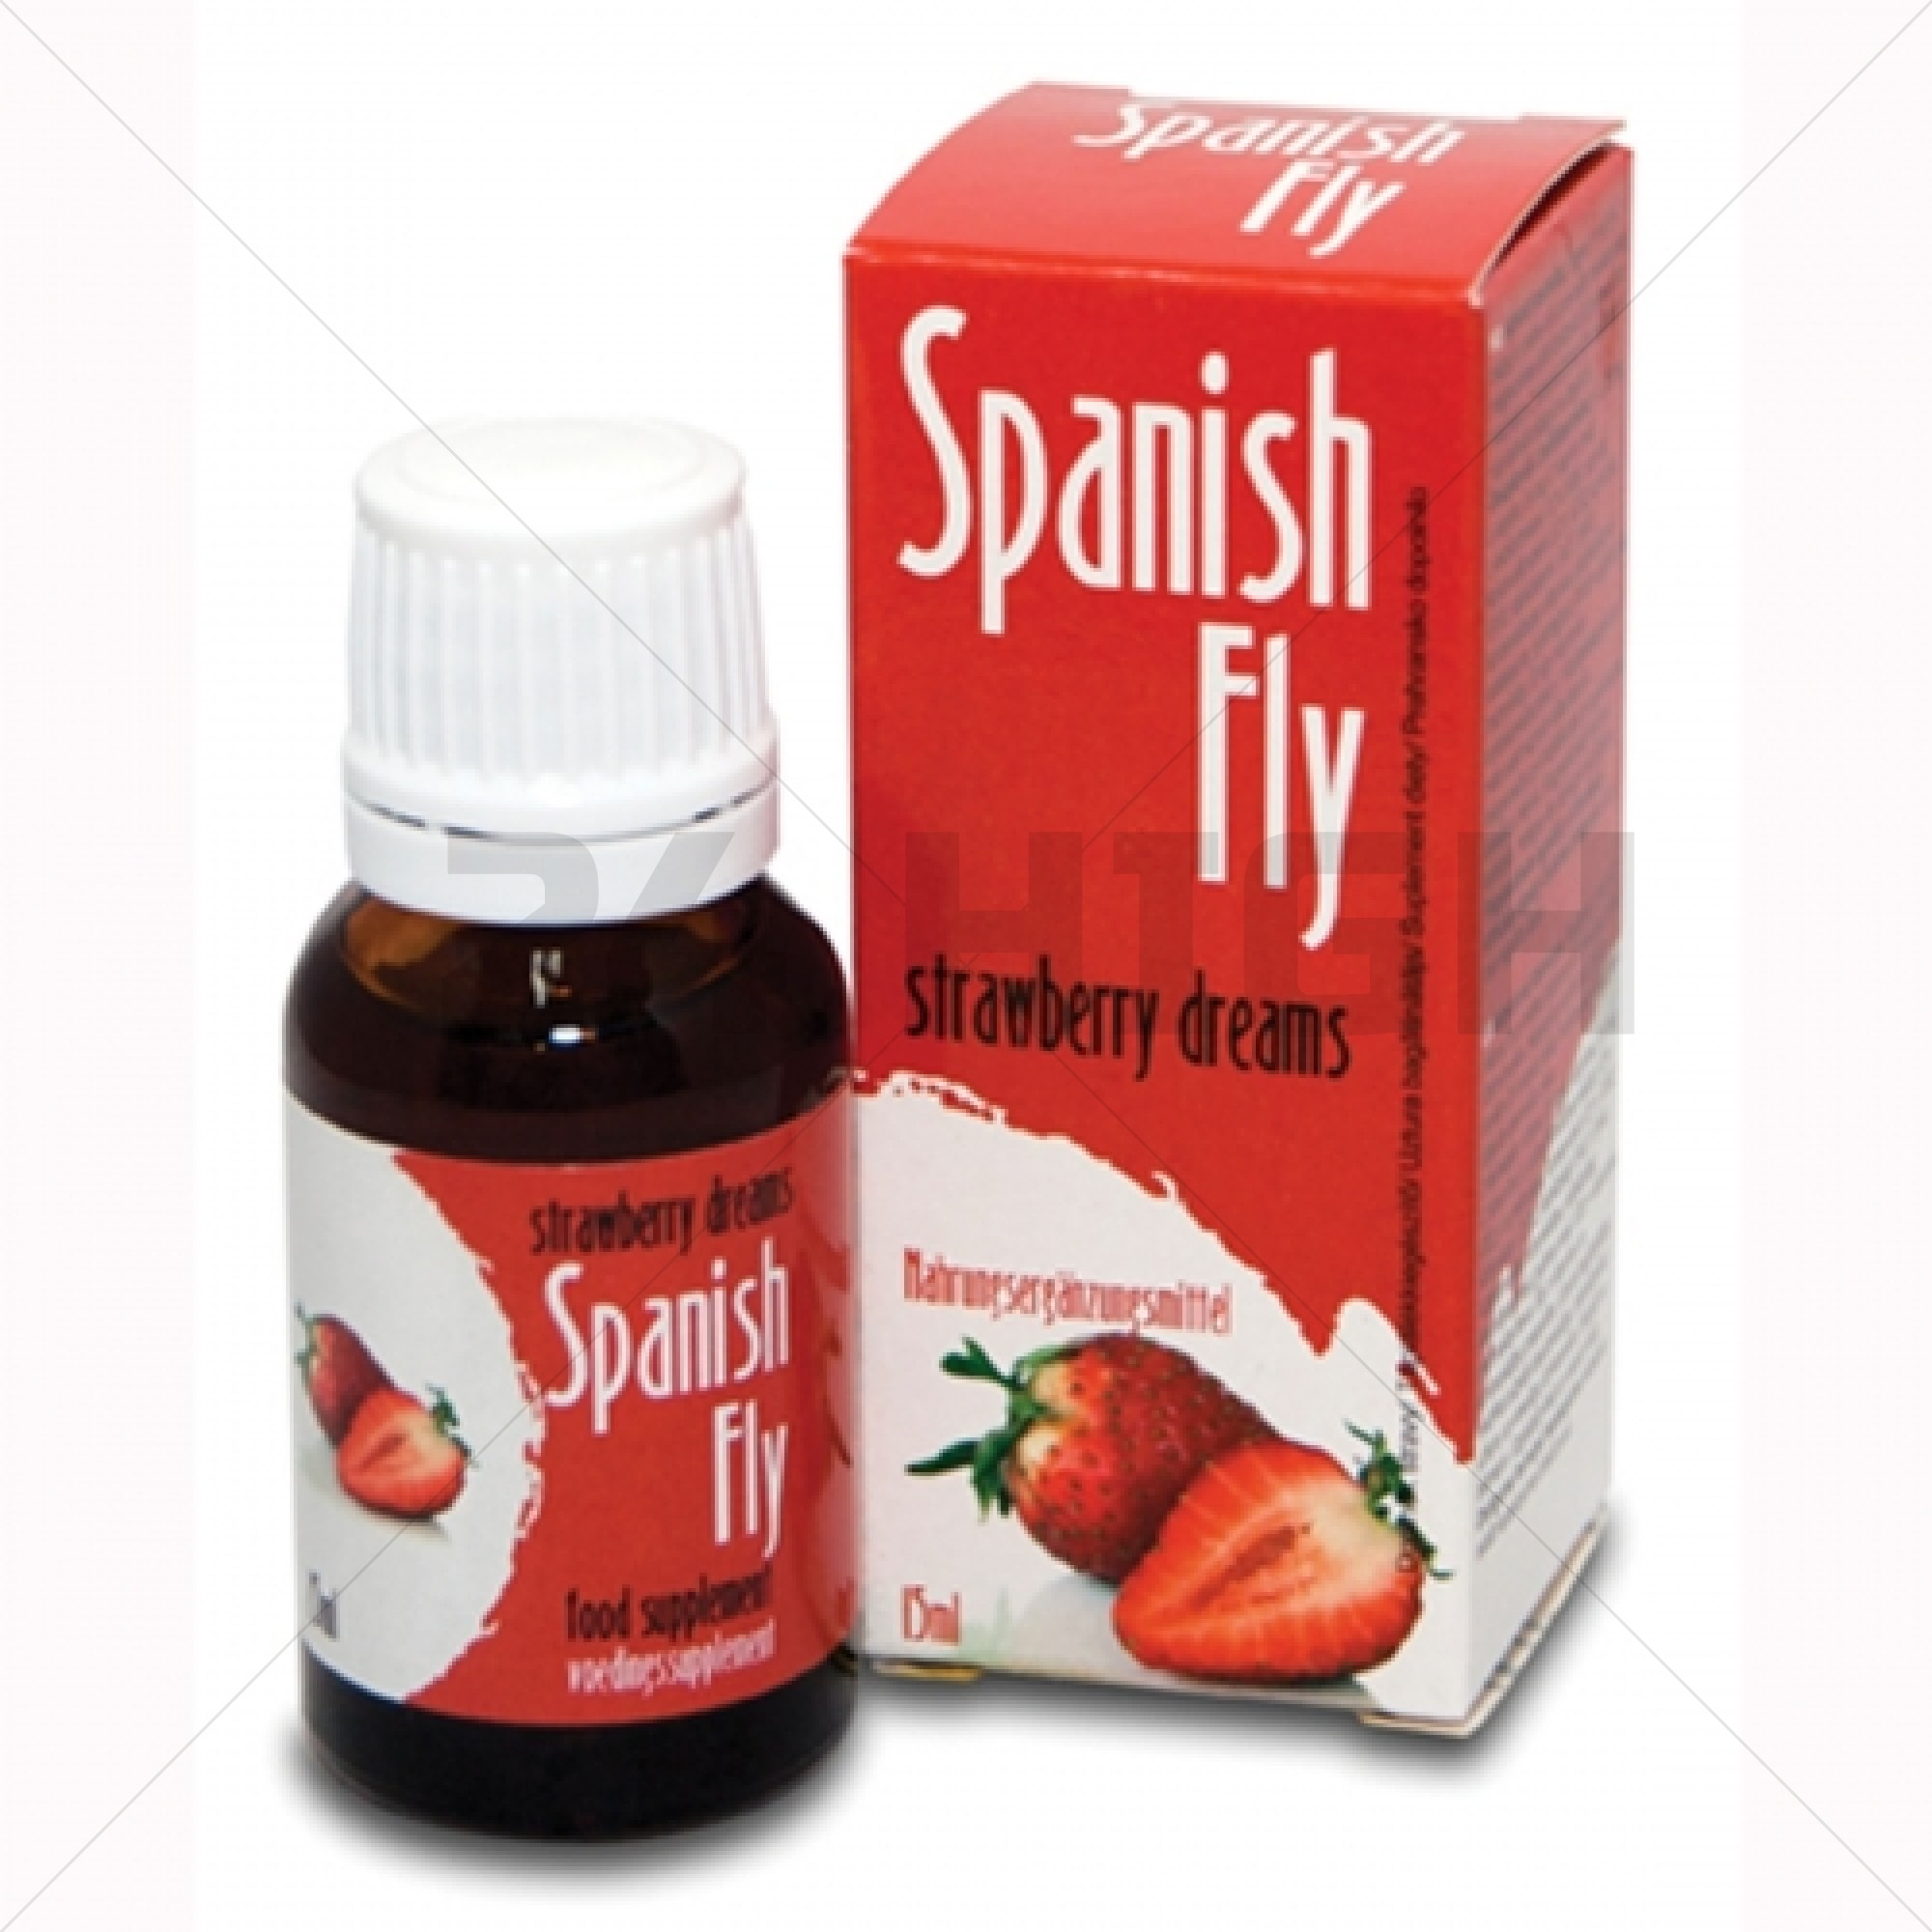 Spanish Fly Strawberry Dreams - 15 ml